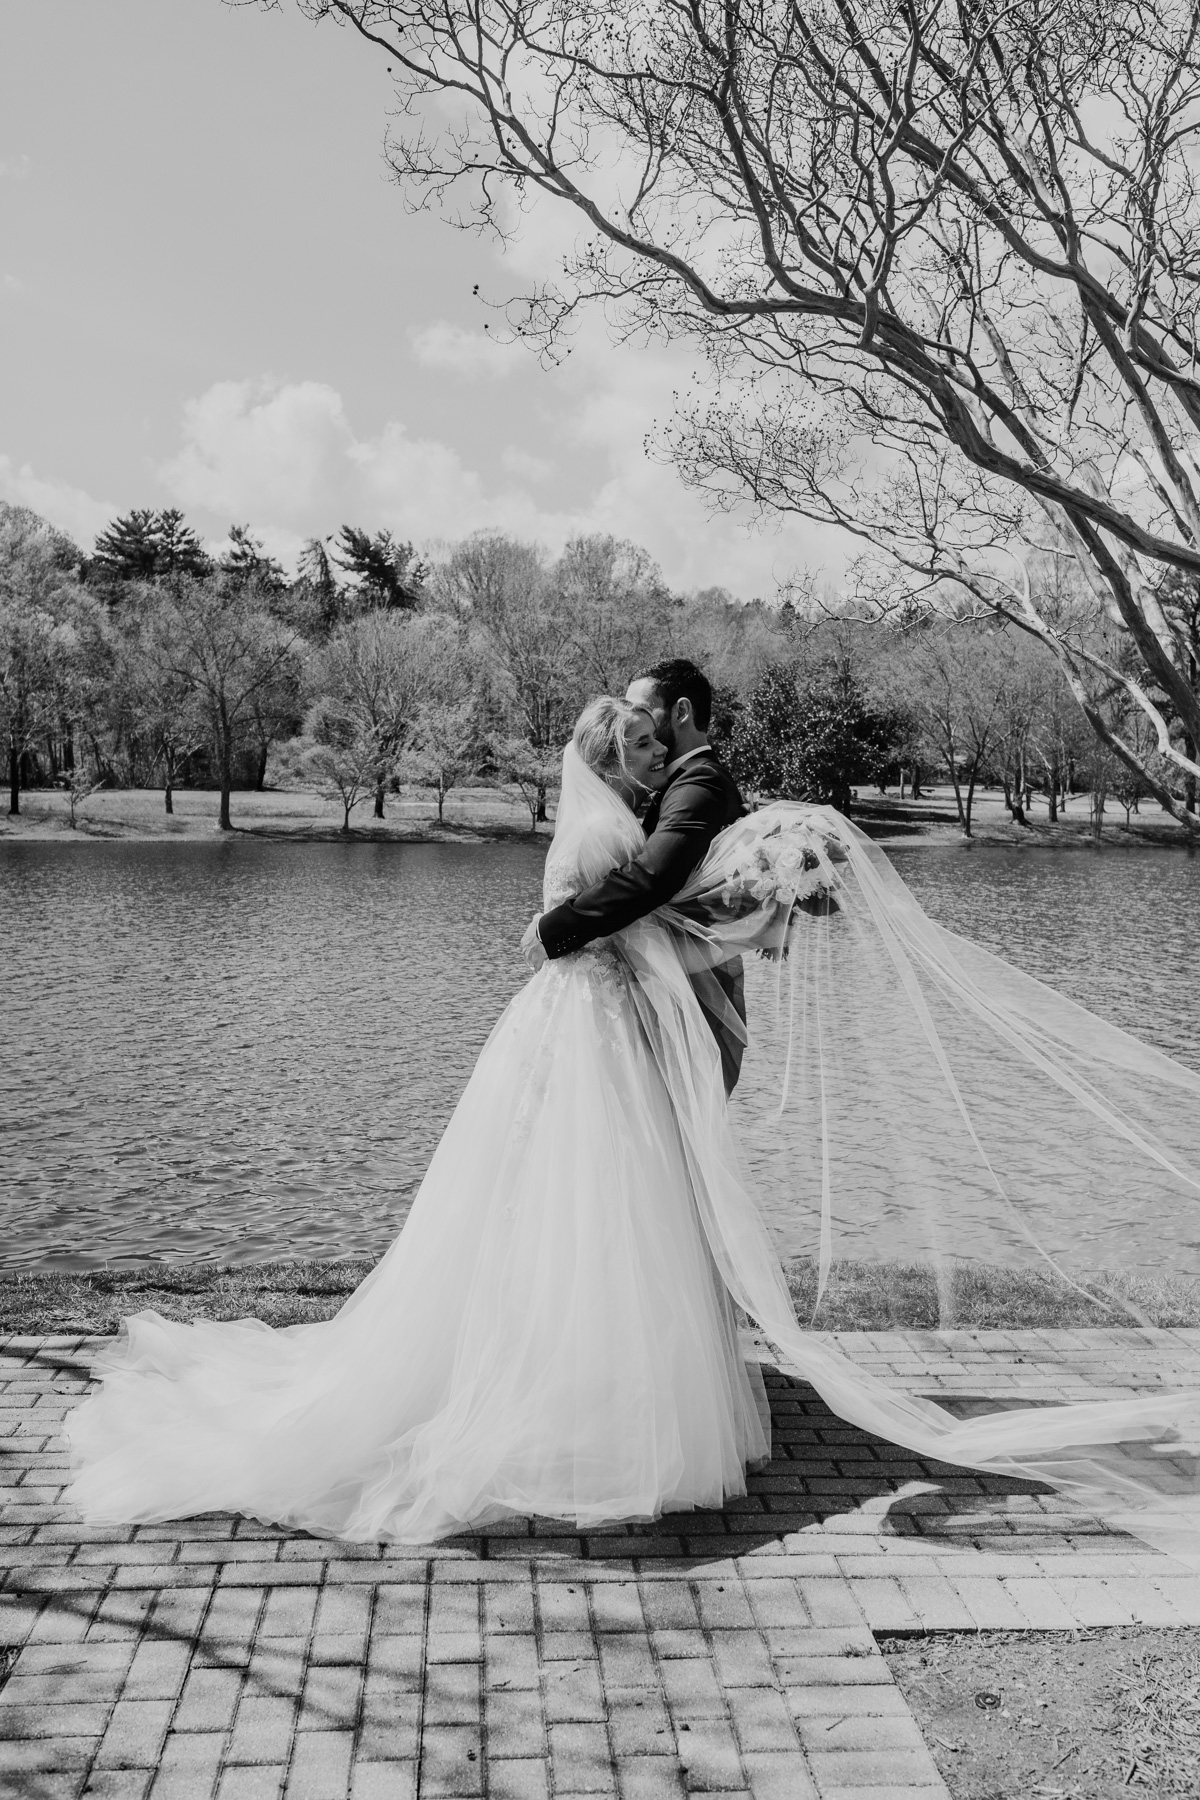 unique-black-and-white-wedding-photos.jpg